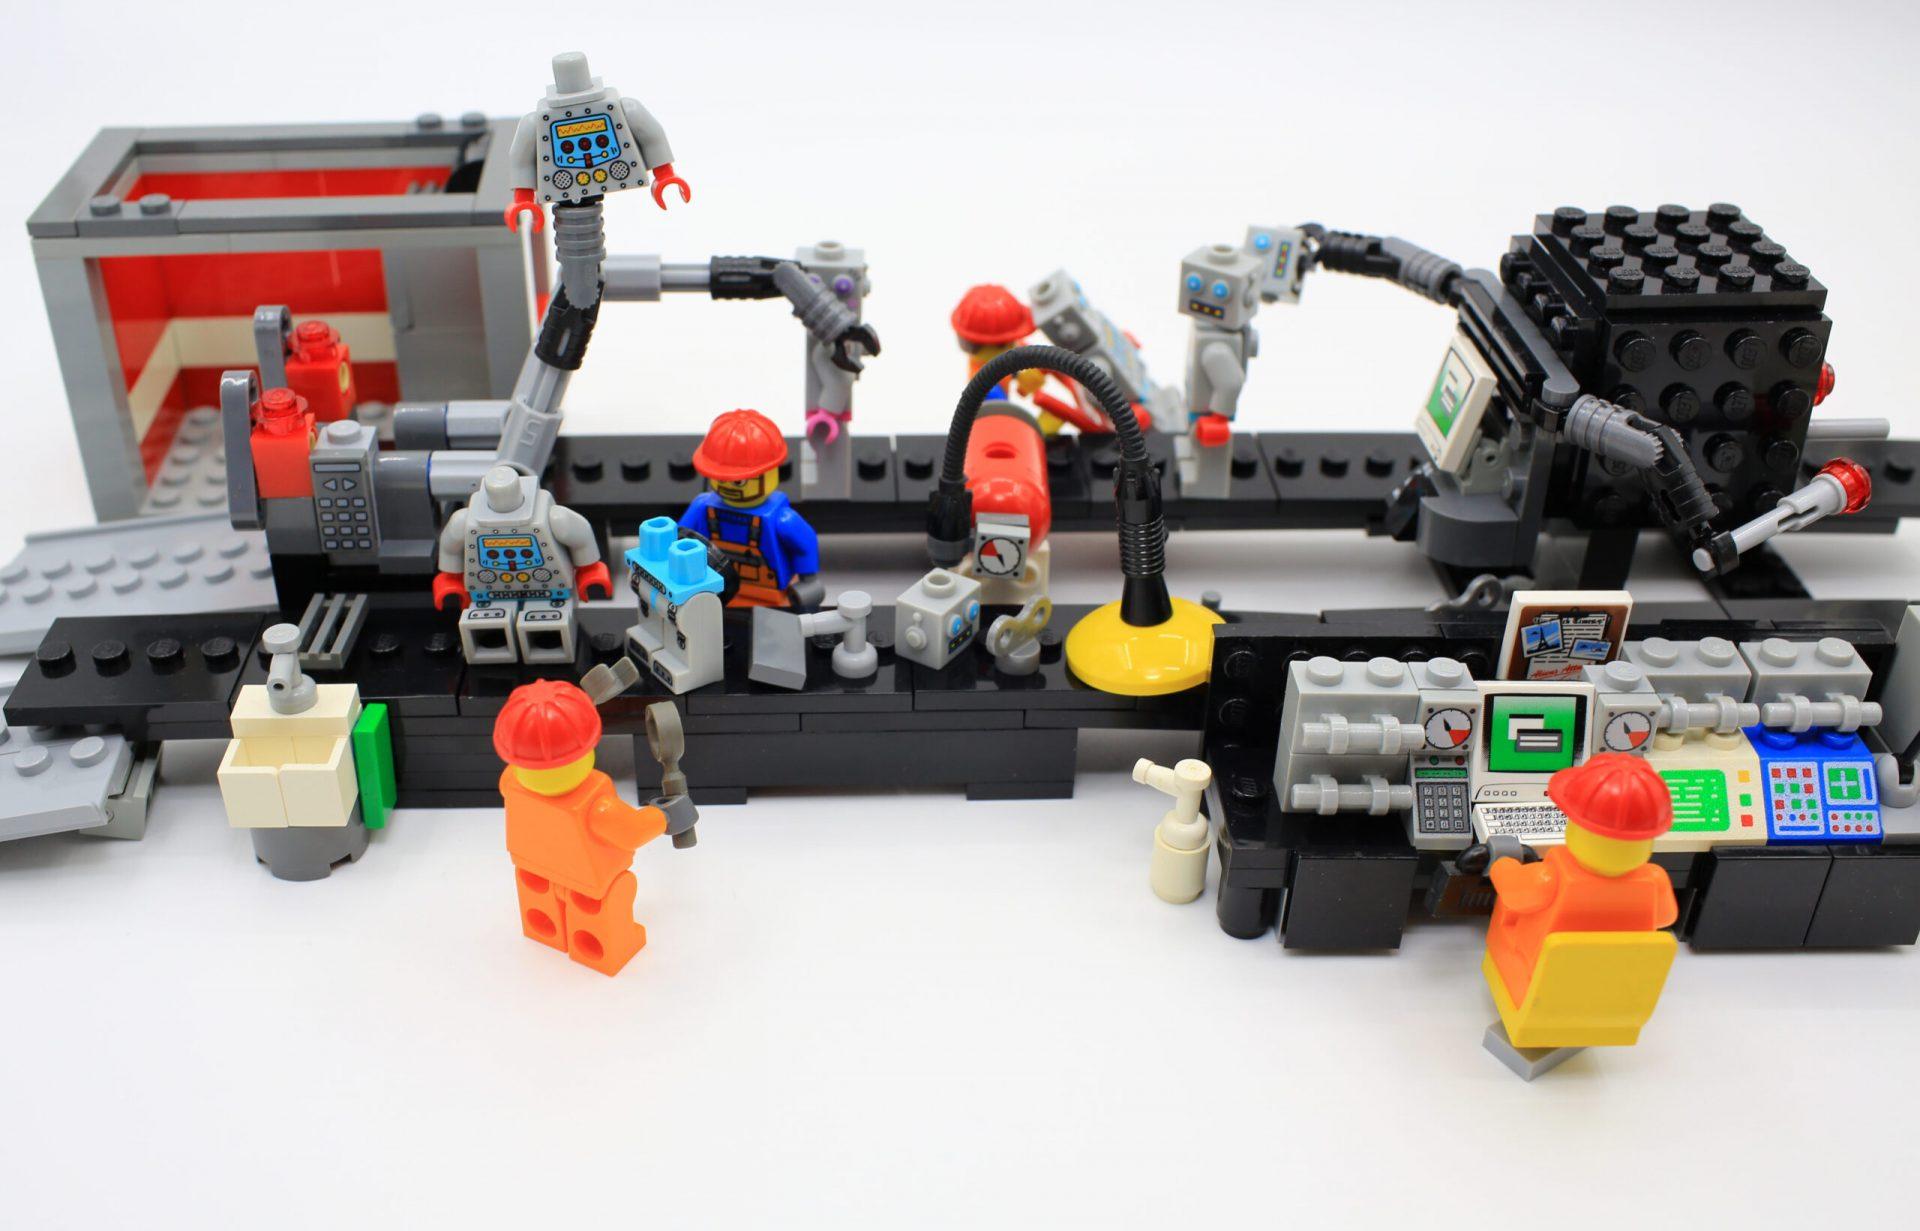 lego manufacturing plant replica